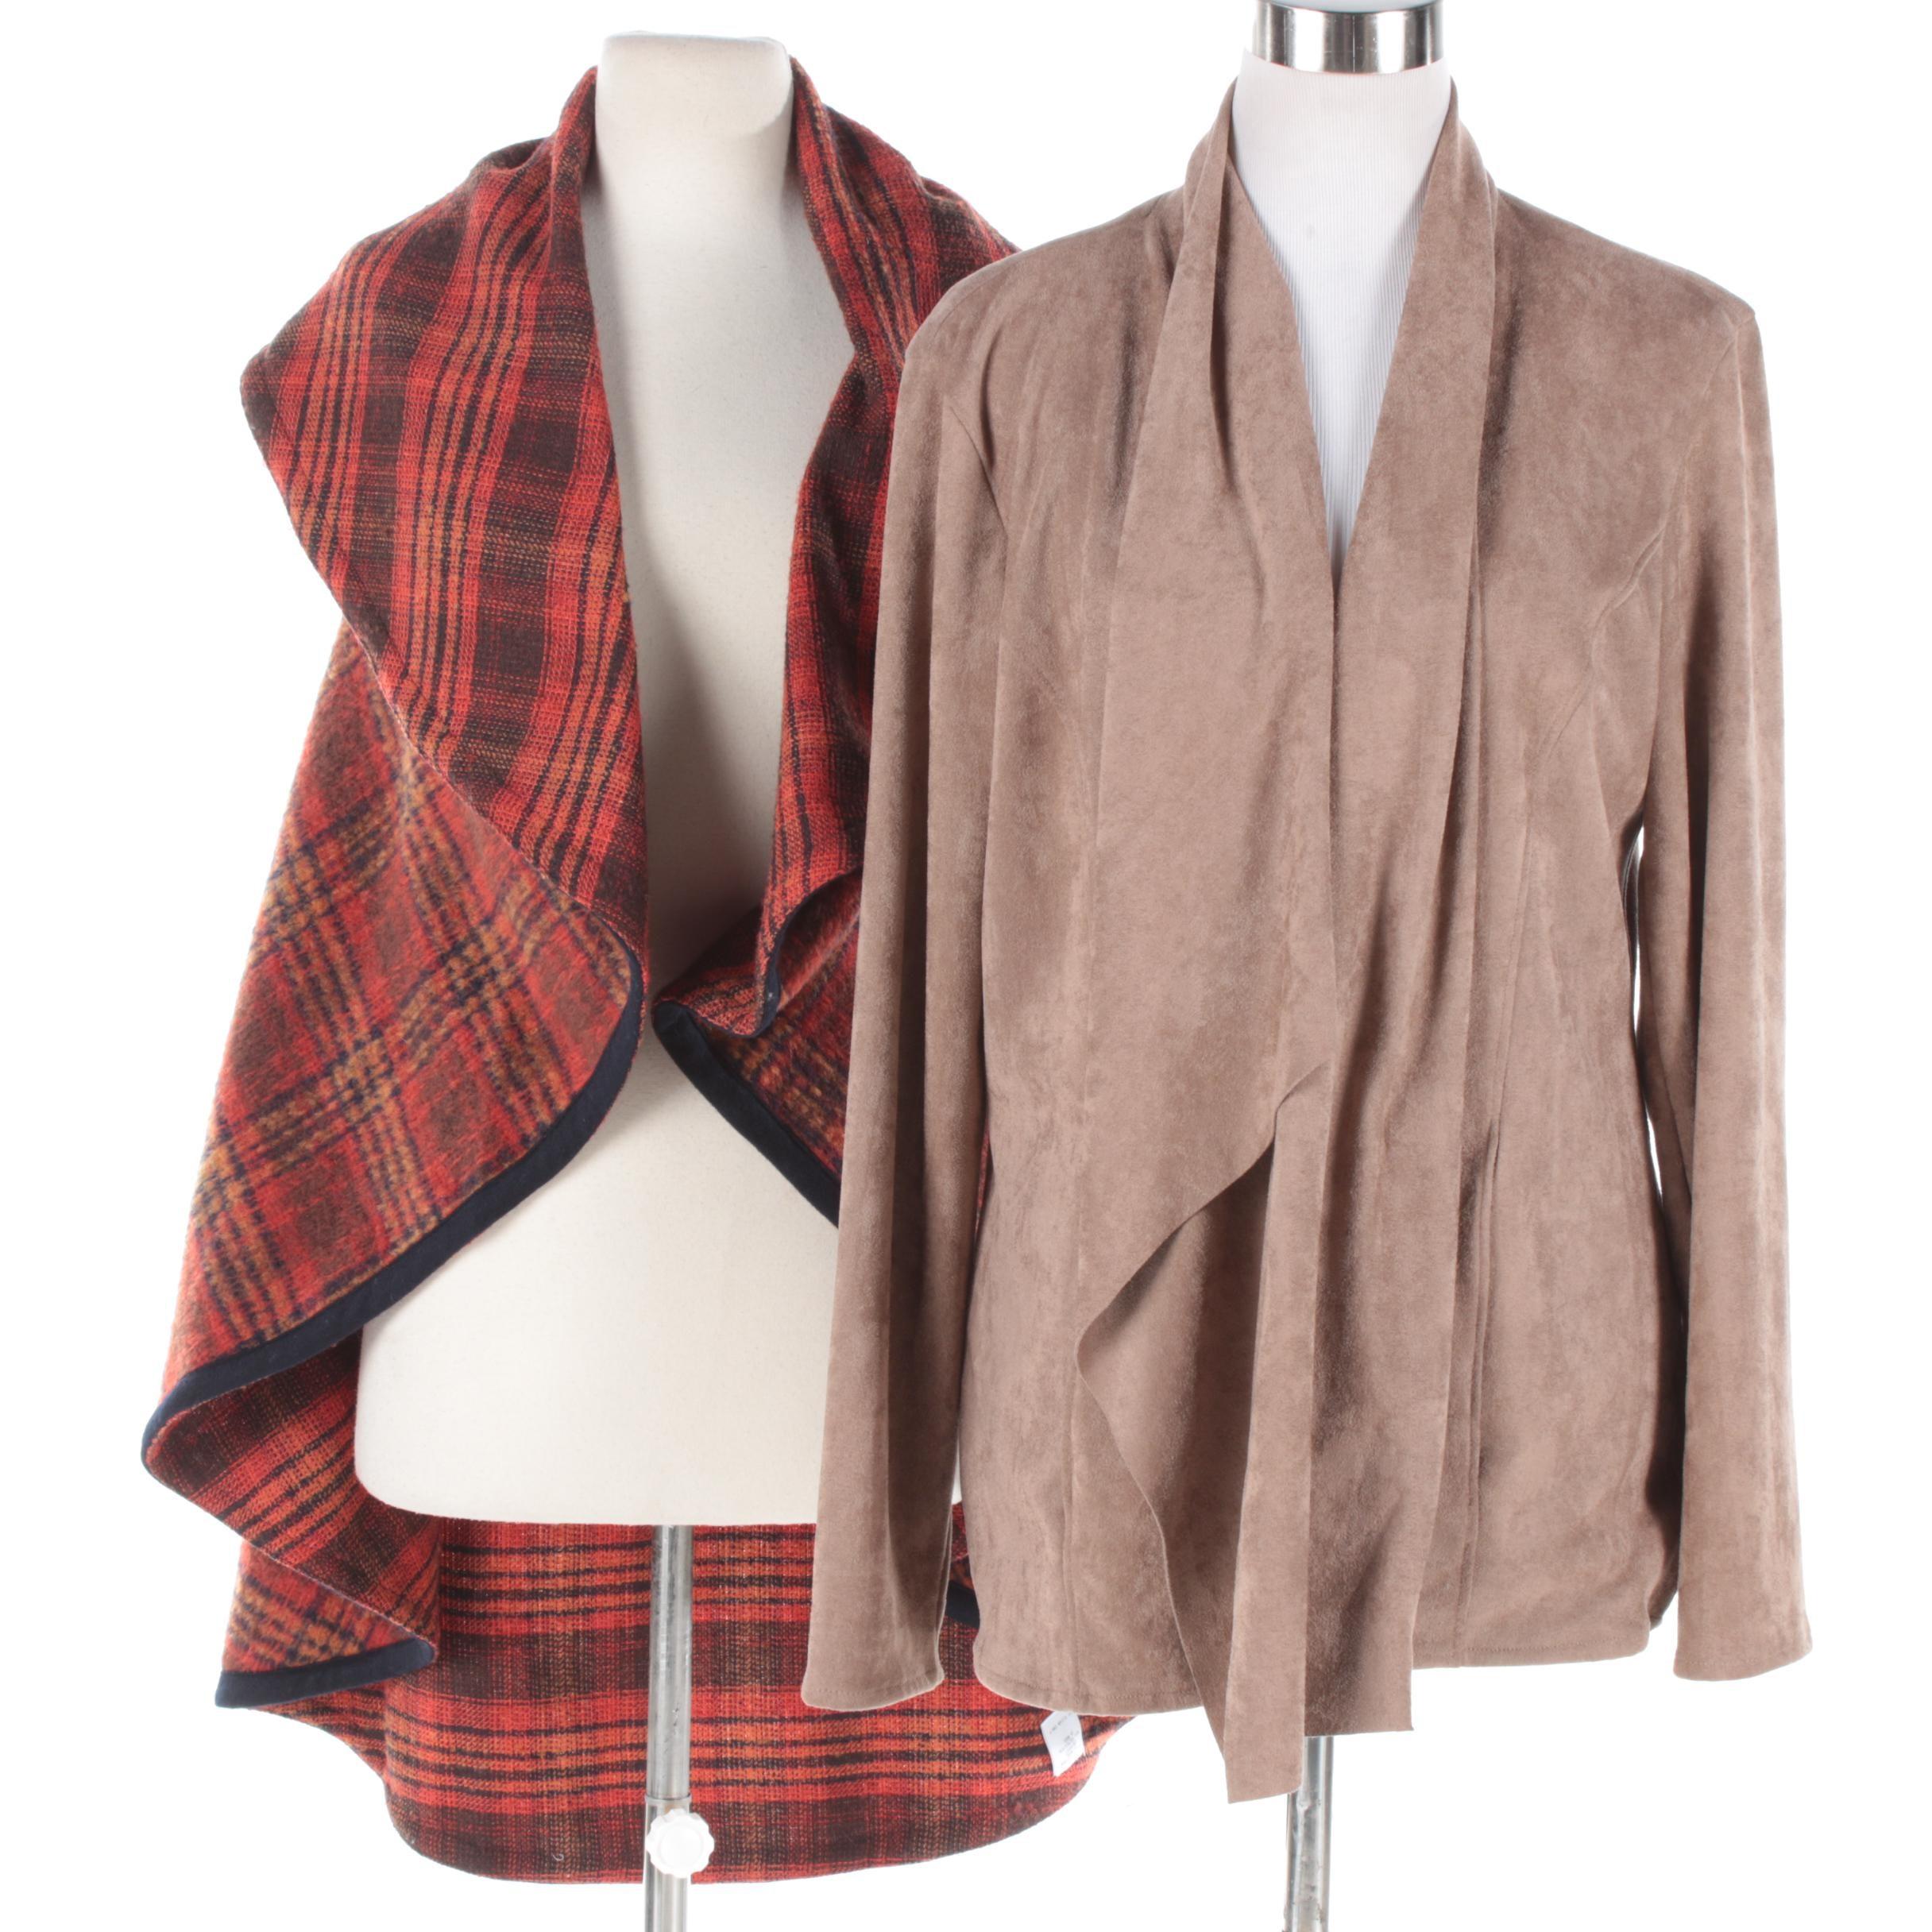 Women's Open Front Vest and Faux Suede Jacket